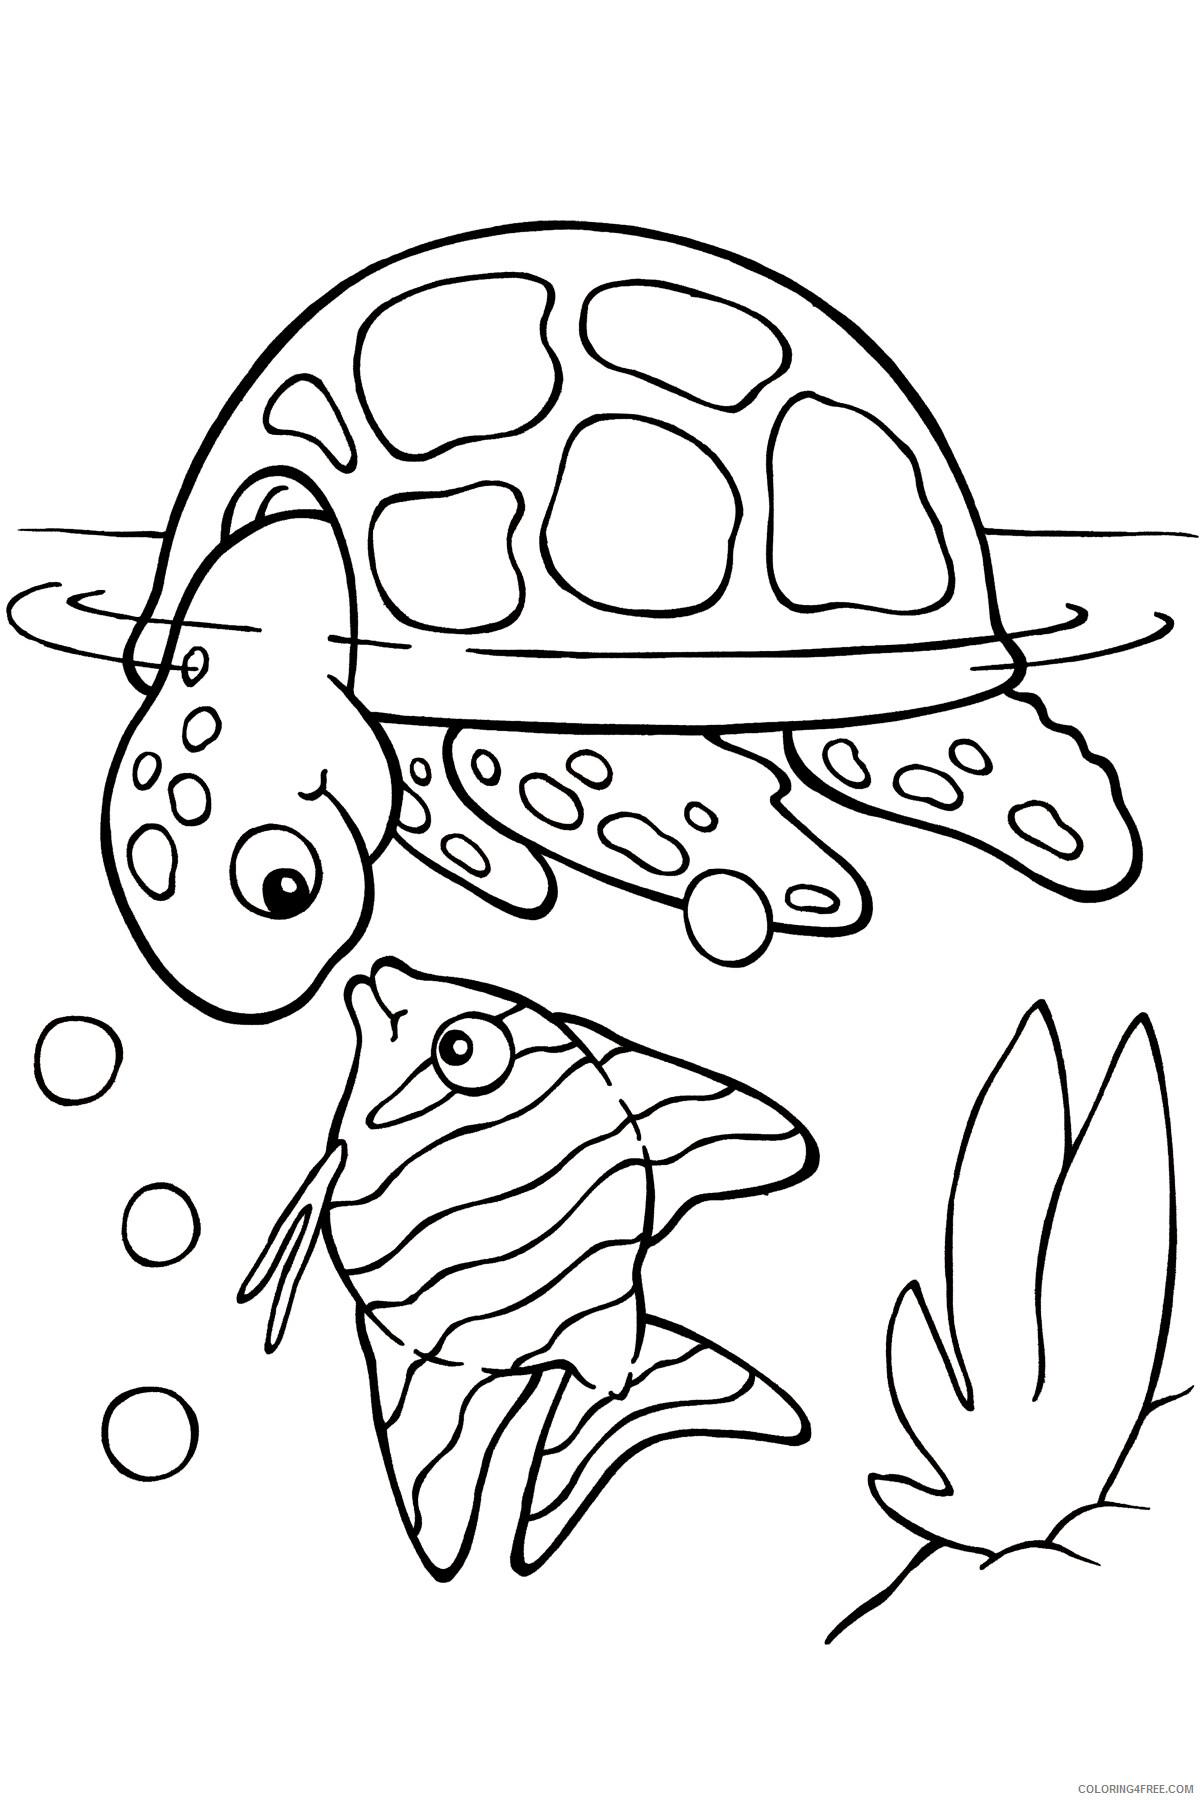 Sea Turtle Coloring Pages Animal Printable Sheets Sea Turtles ...